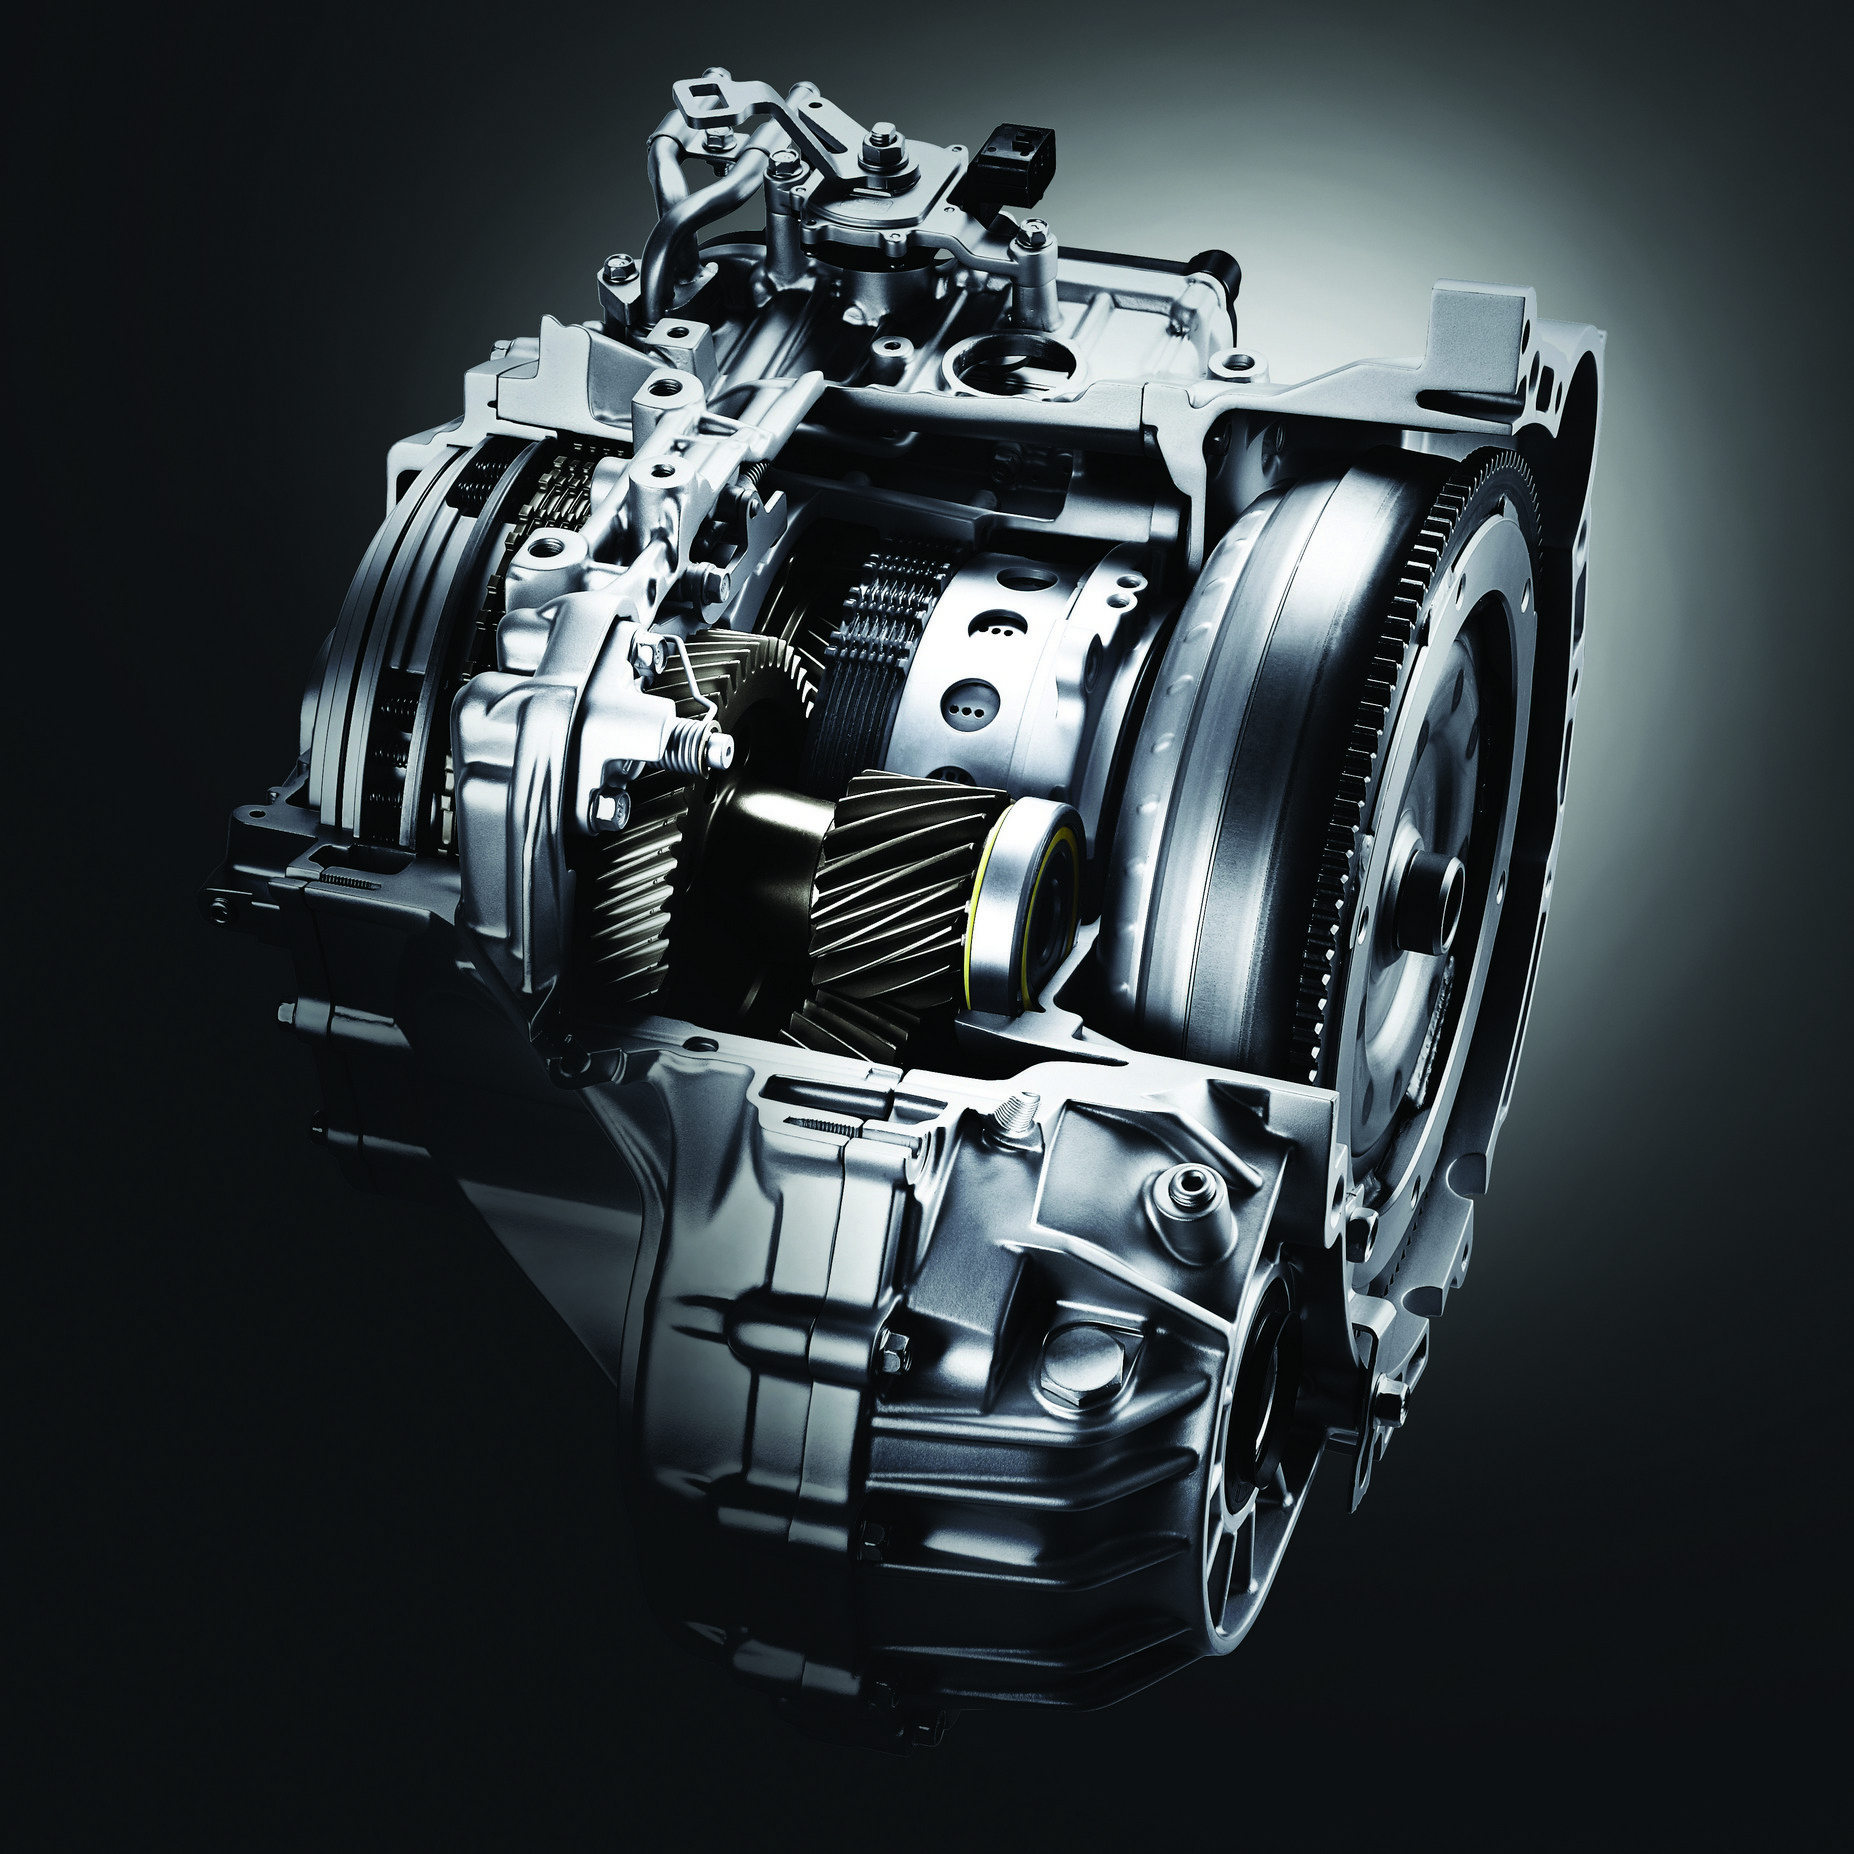 Kia's 8-Speed FWD Automatic Transmission